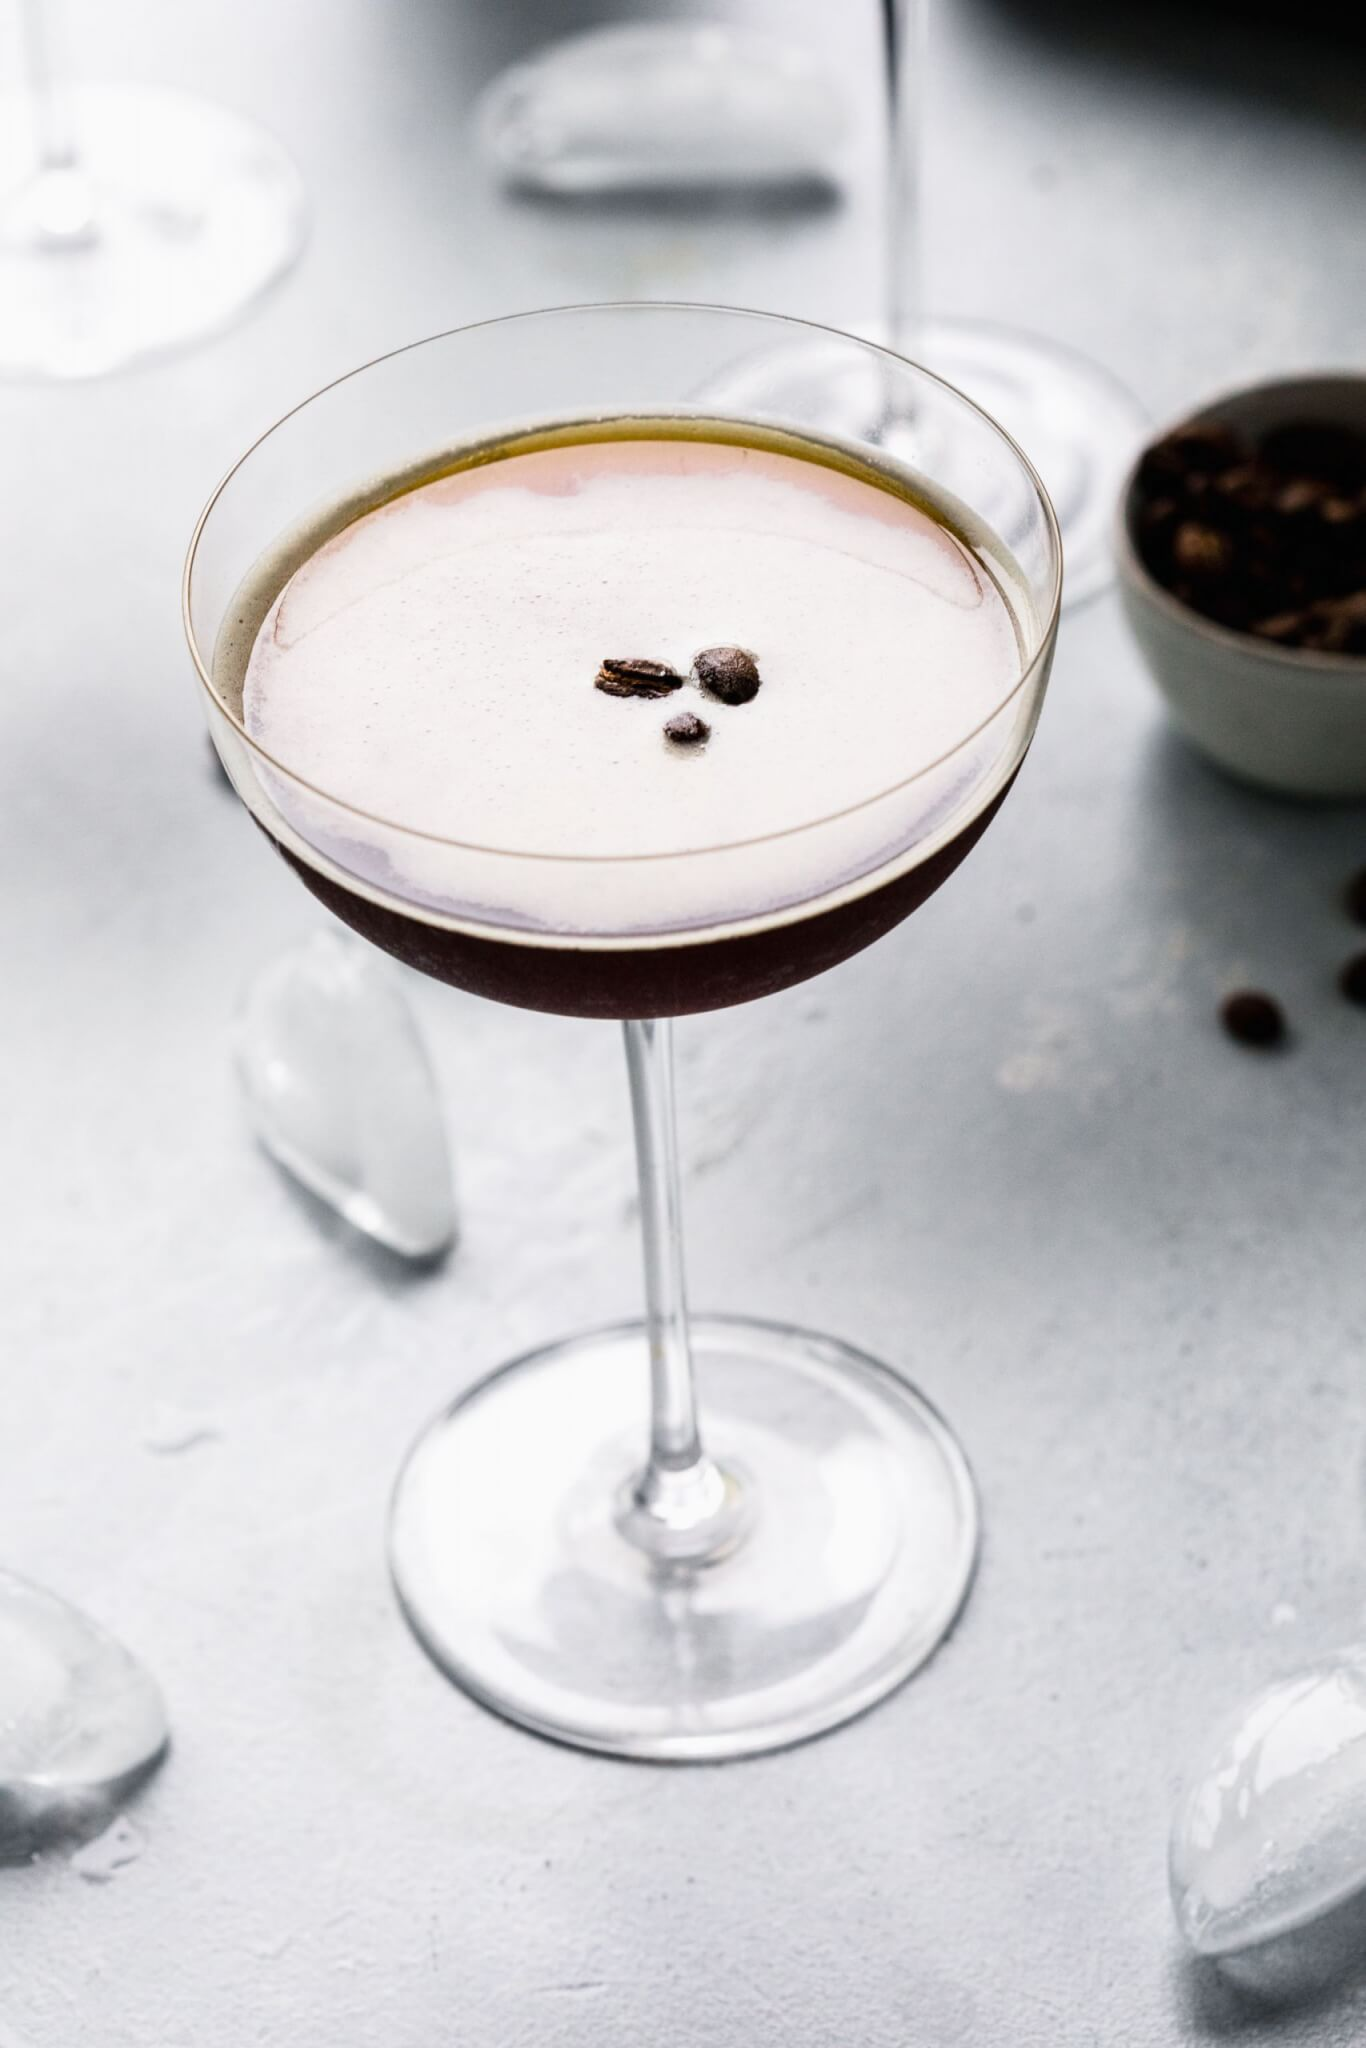 Single espresso martini prepared with good froth on top.